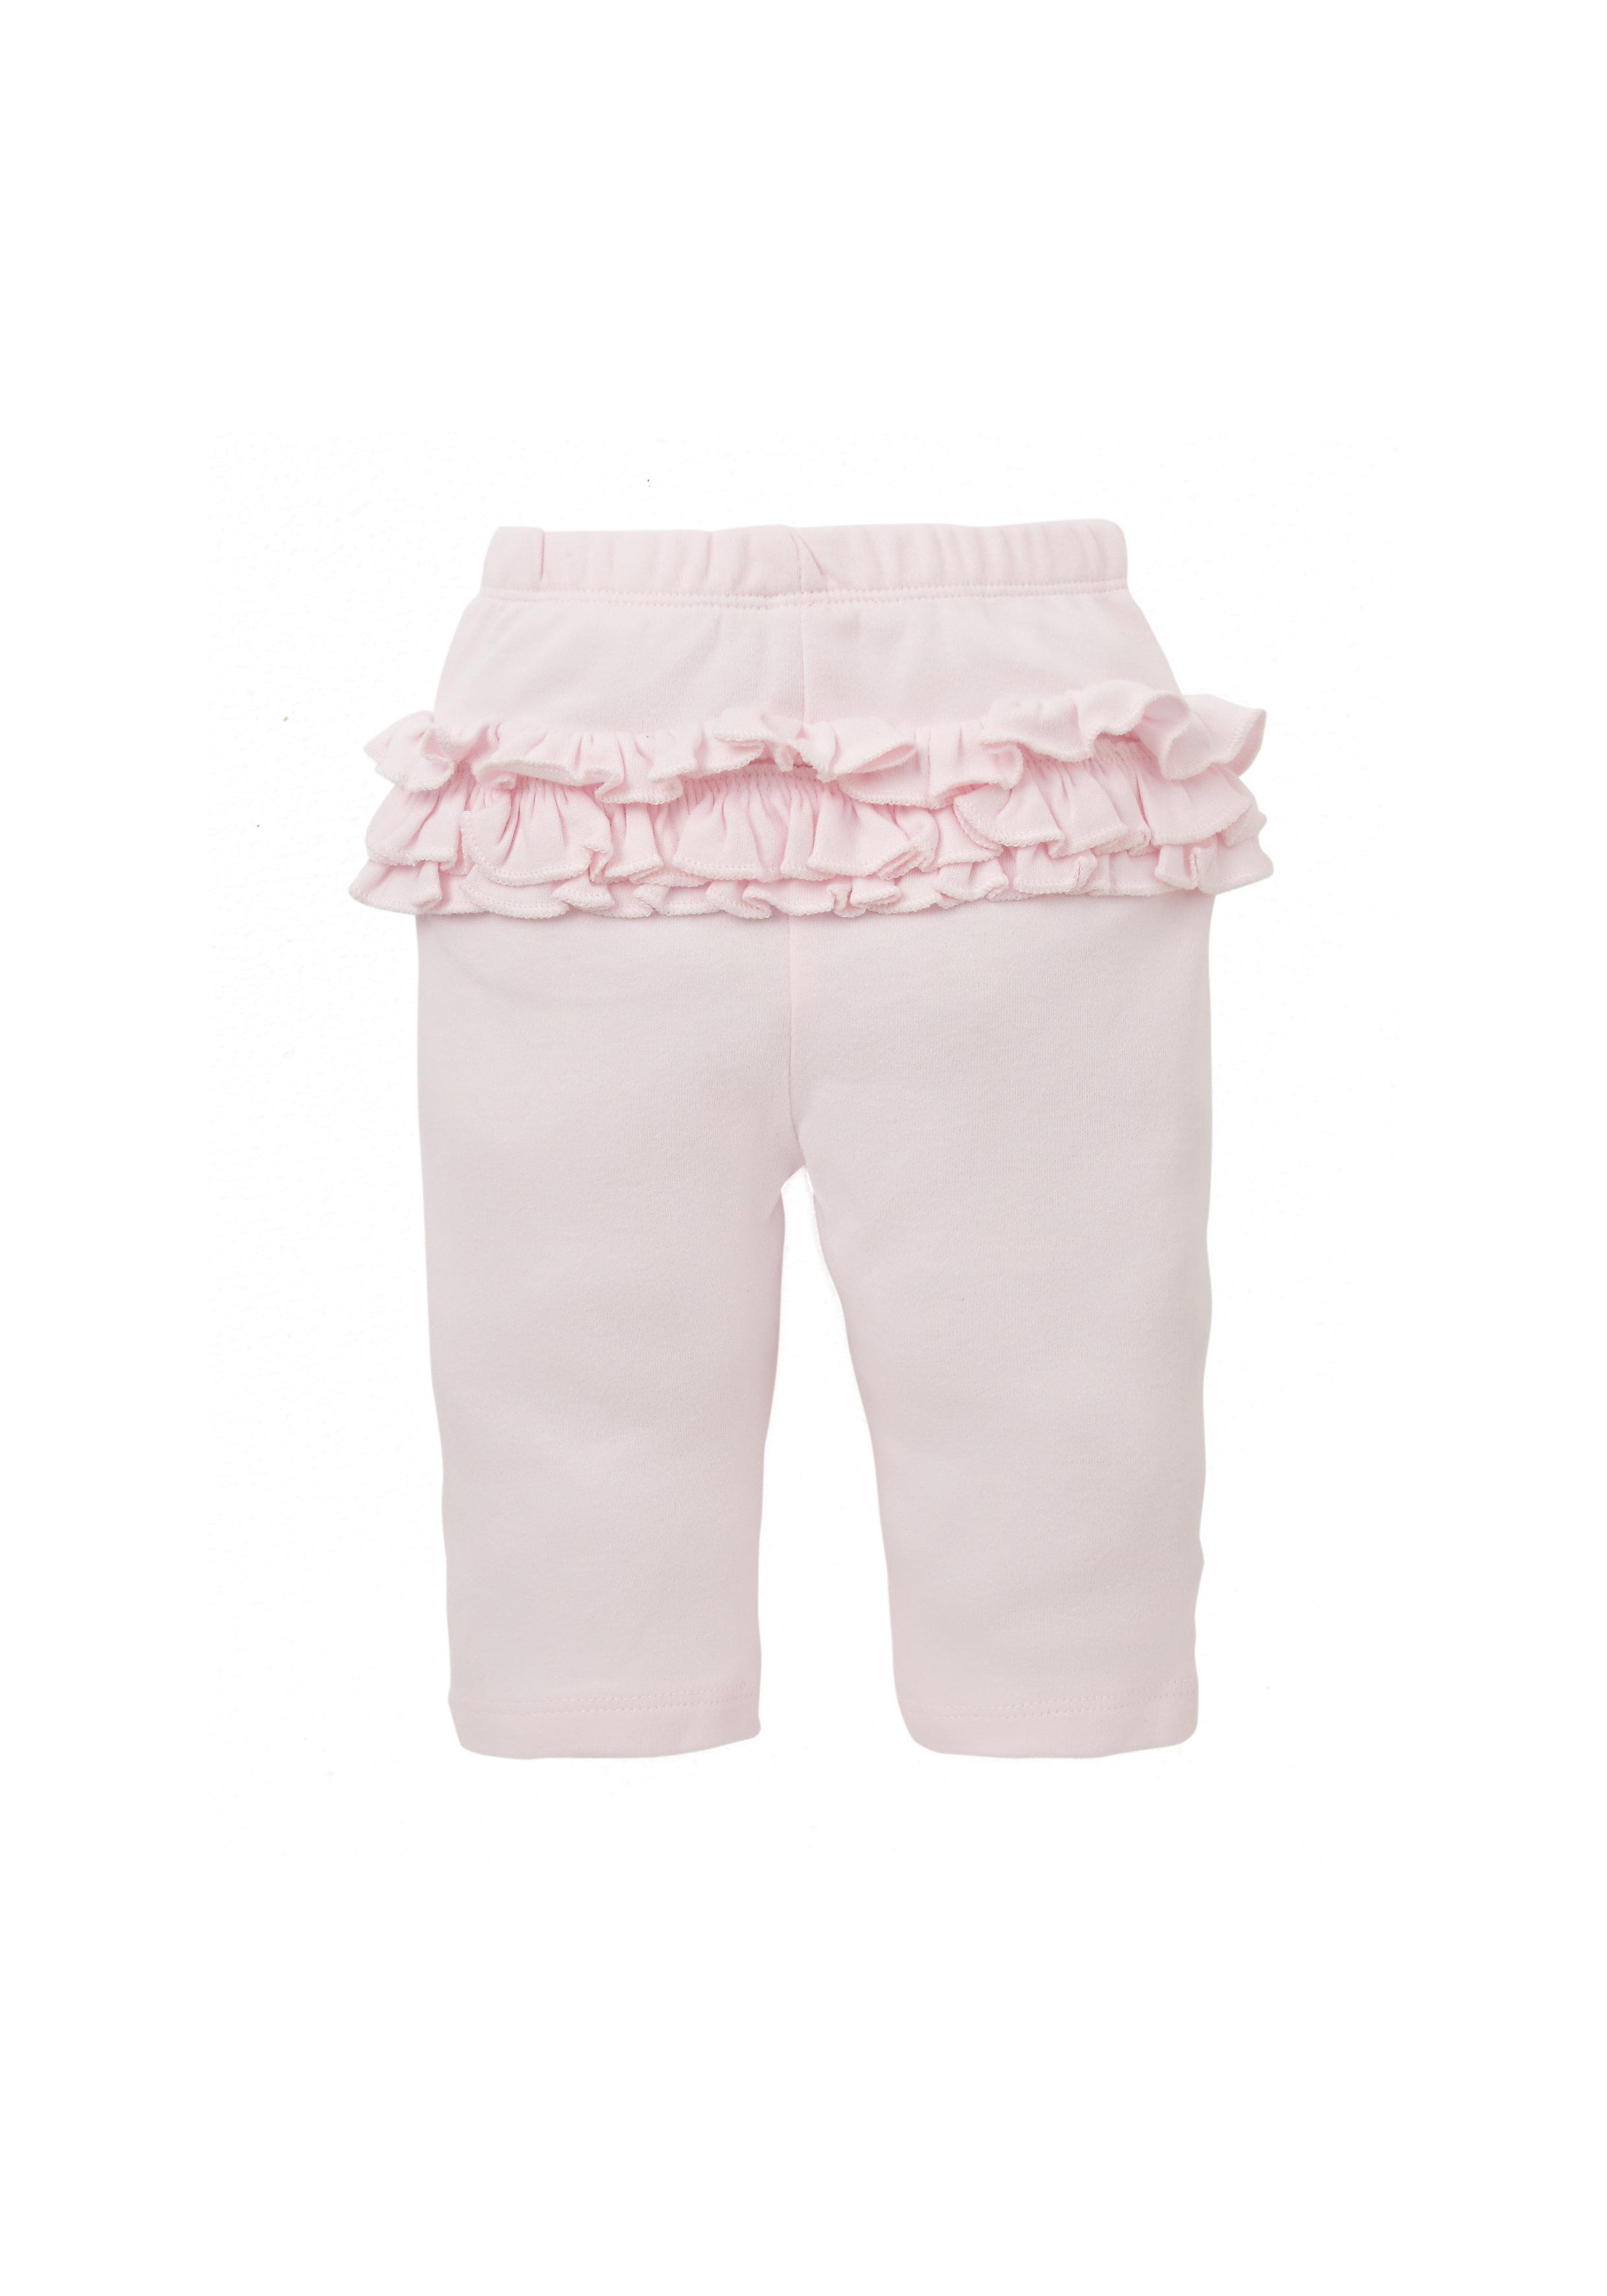 Mothercare | Girls Frilly Leggings - Pink